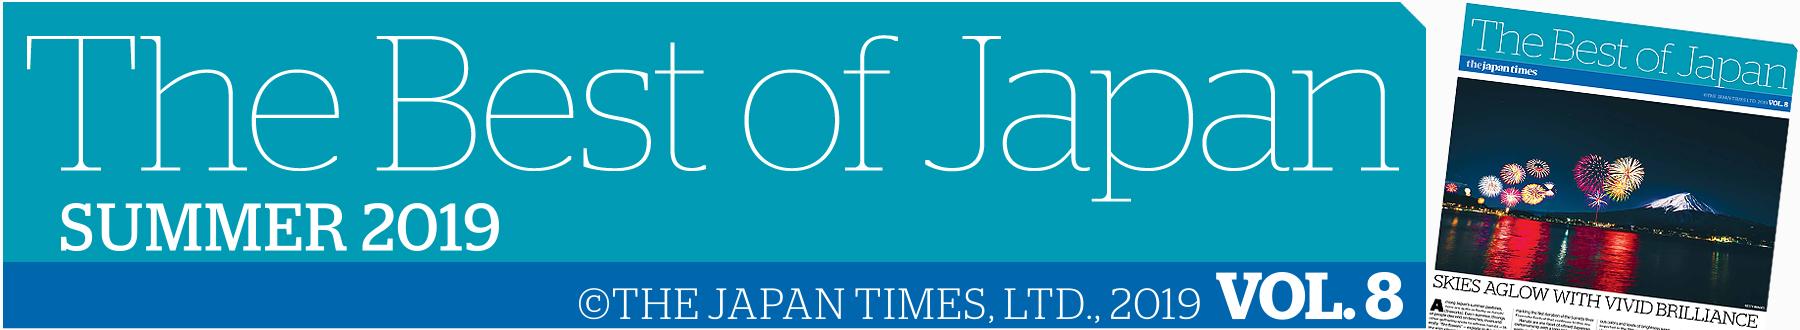 The Best of Japan vol.8